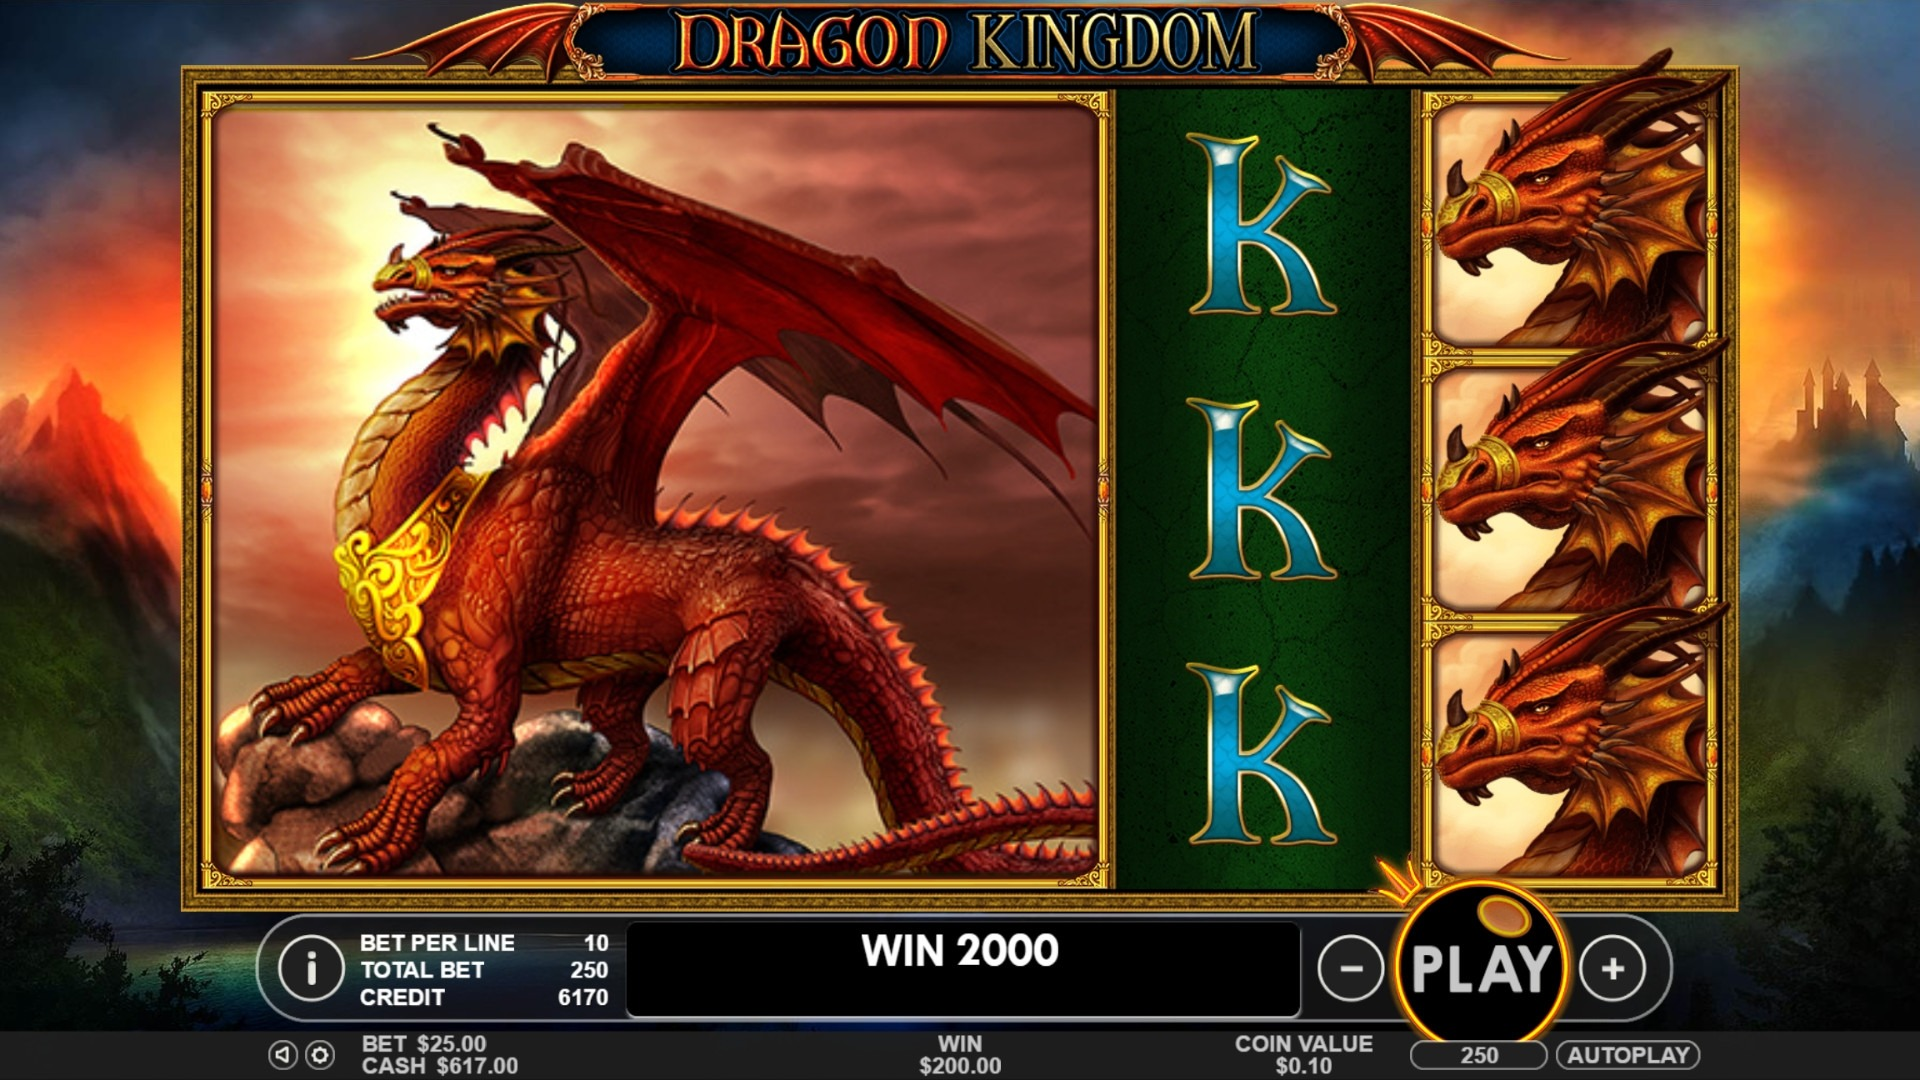 Dragon Kingdom Slot Game Symbols and Winning Combinations